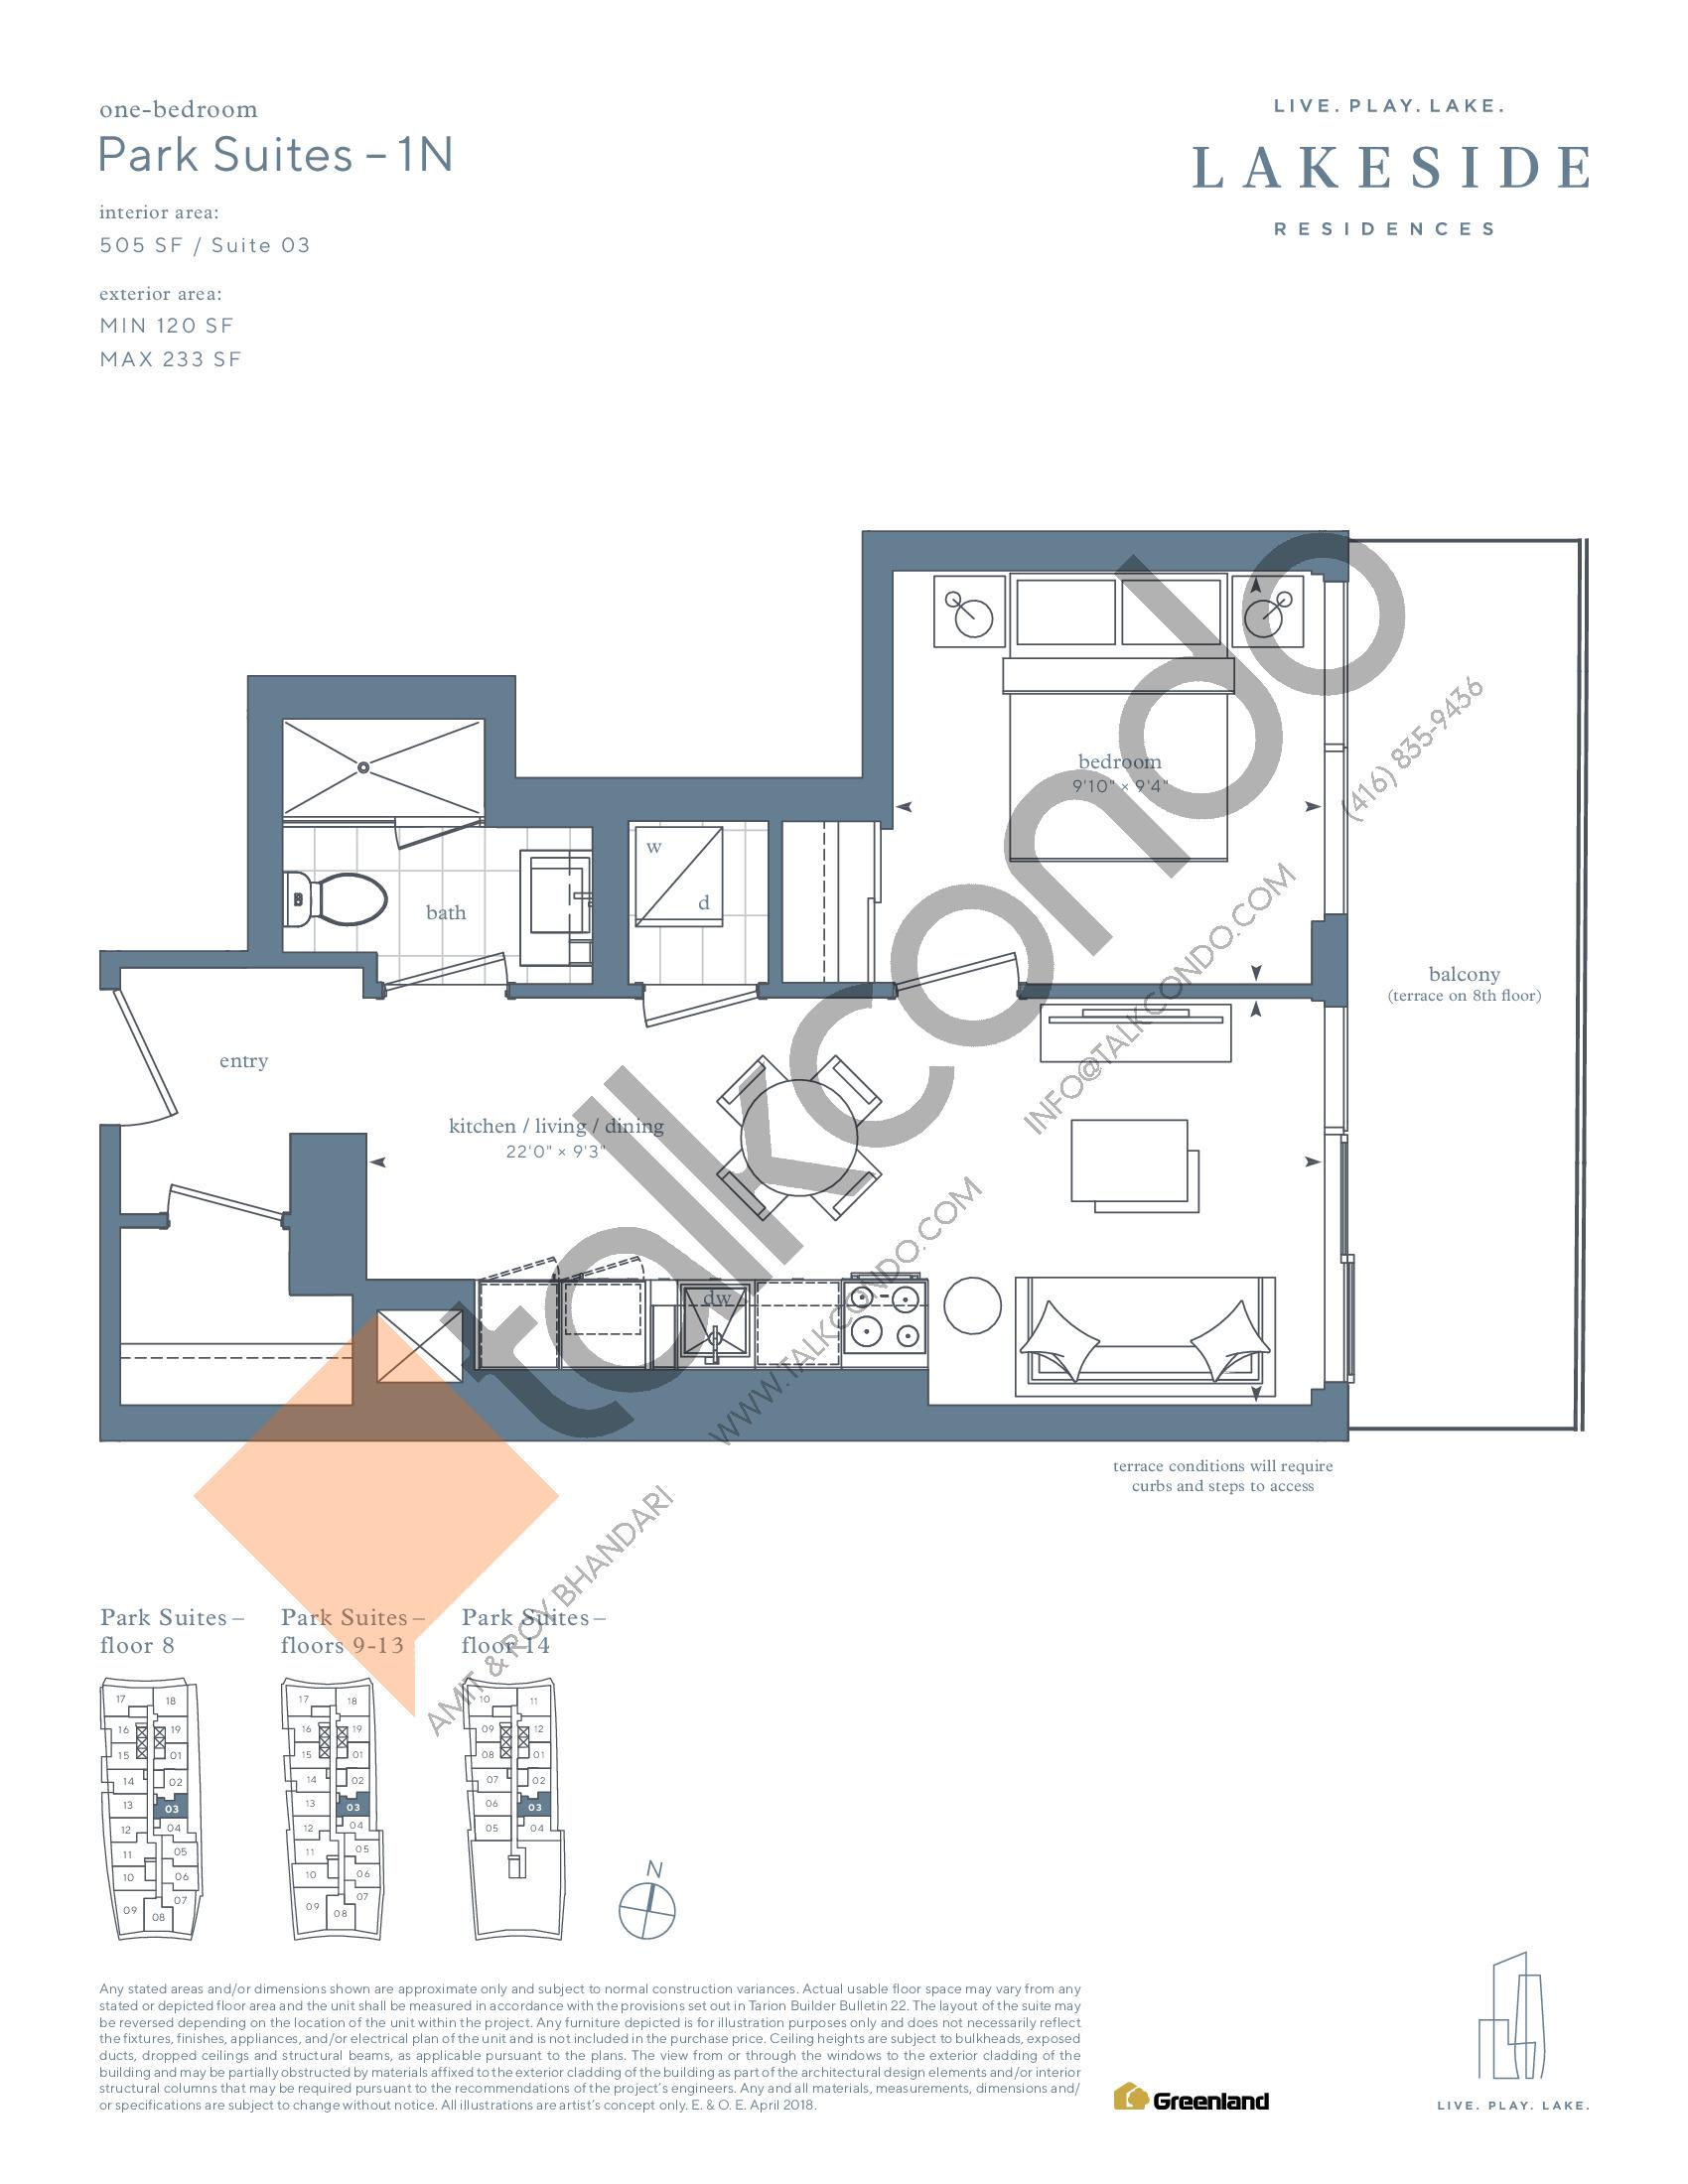 Park Suites - 1N Floor Plan at Lakeside Residences - 505 sq.ft